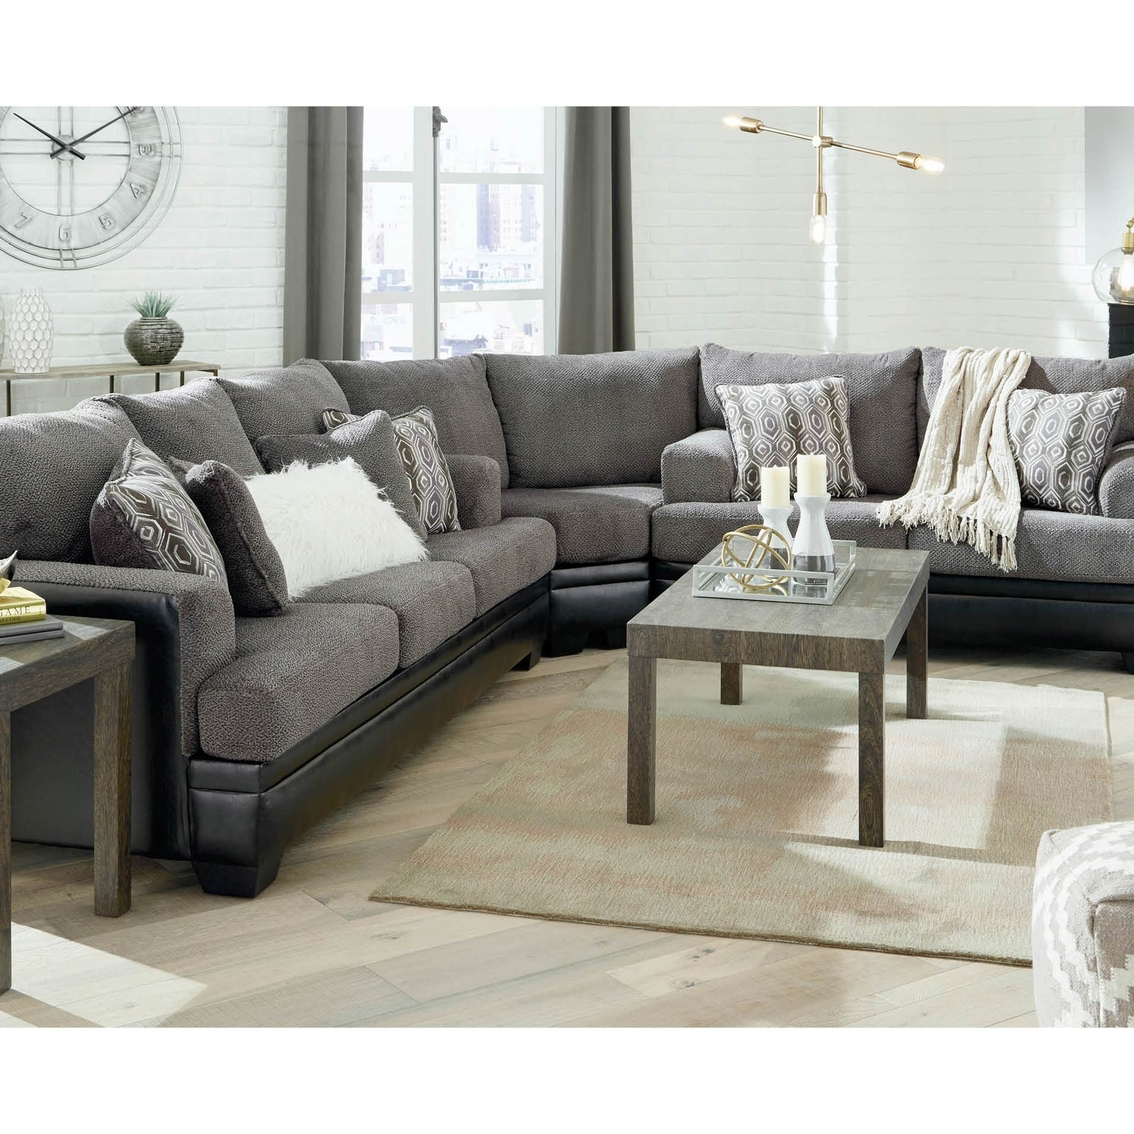 signature design by ashley millingar 3 pc sleeper sectional sofa loveseat wedge